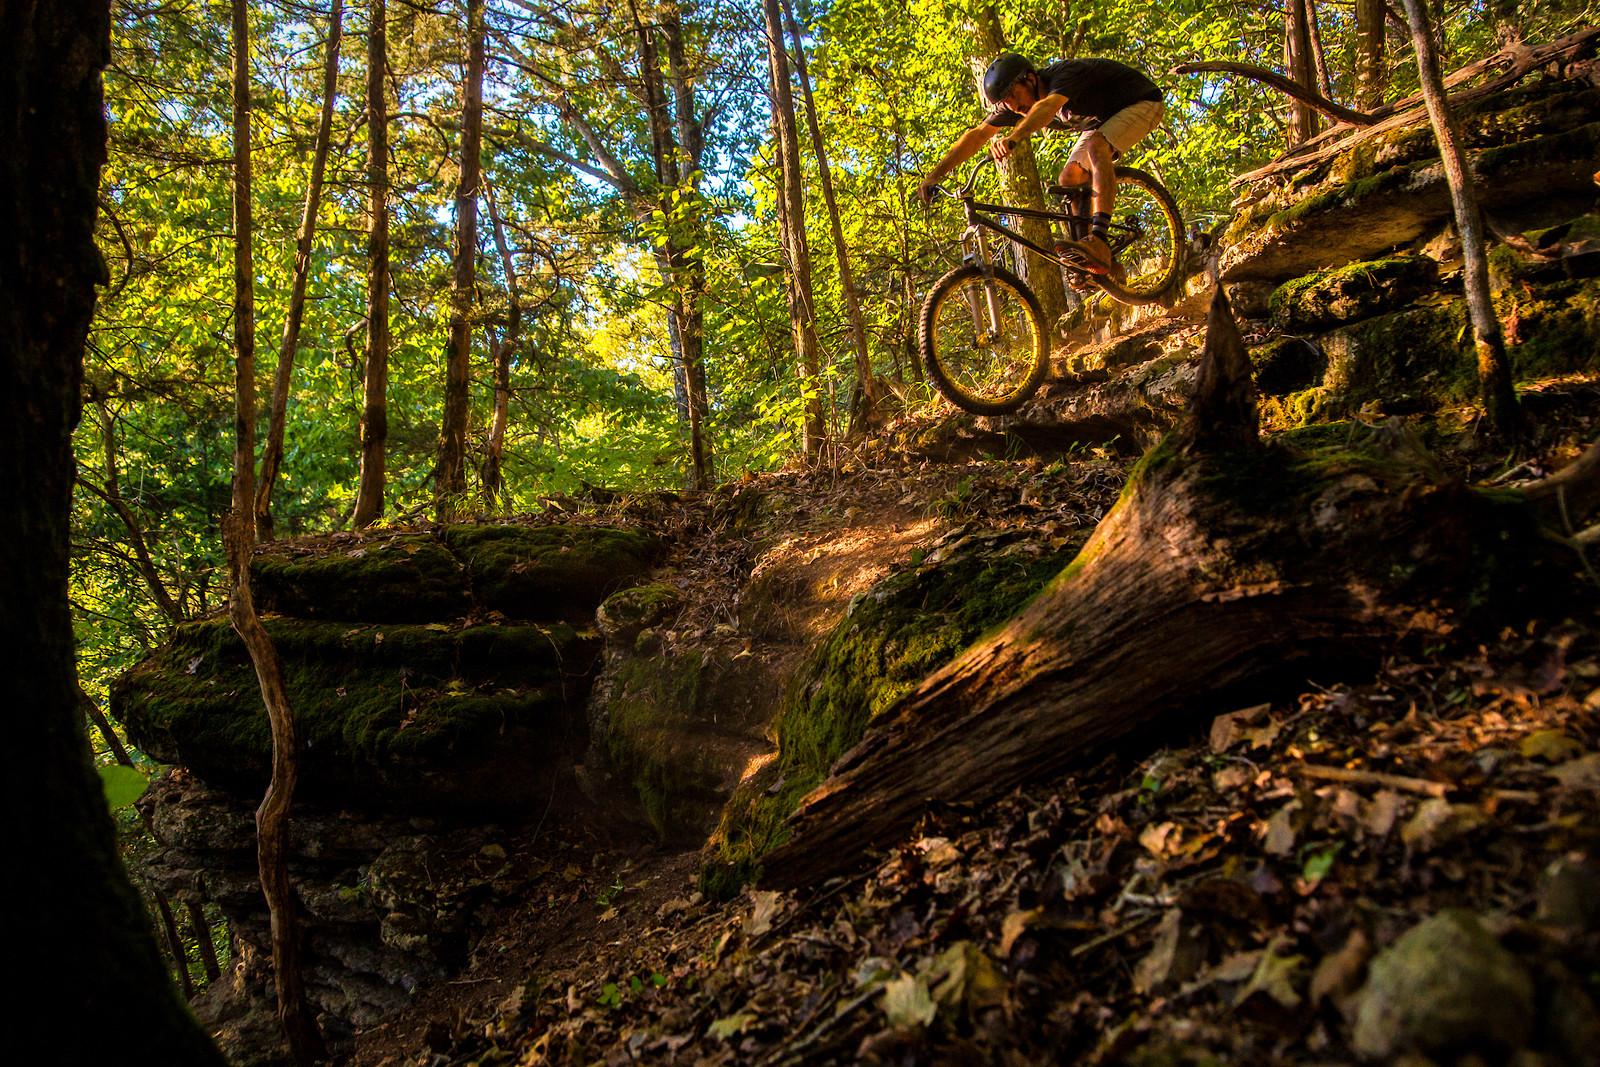 Arkansas rock shelf/slab drop in - slager - Mountain Biking Pictures - Vital MTB